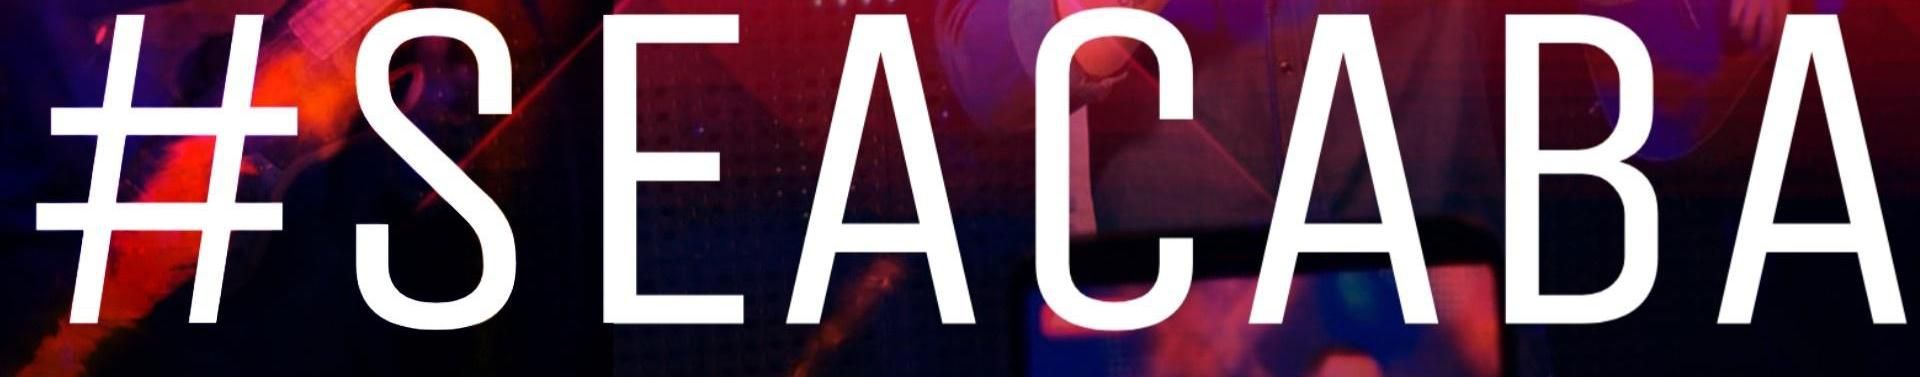 Imagem de capa de Erick Rocha